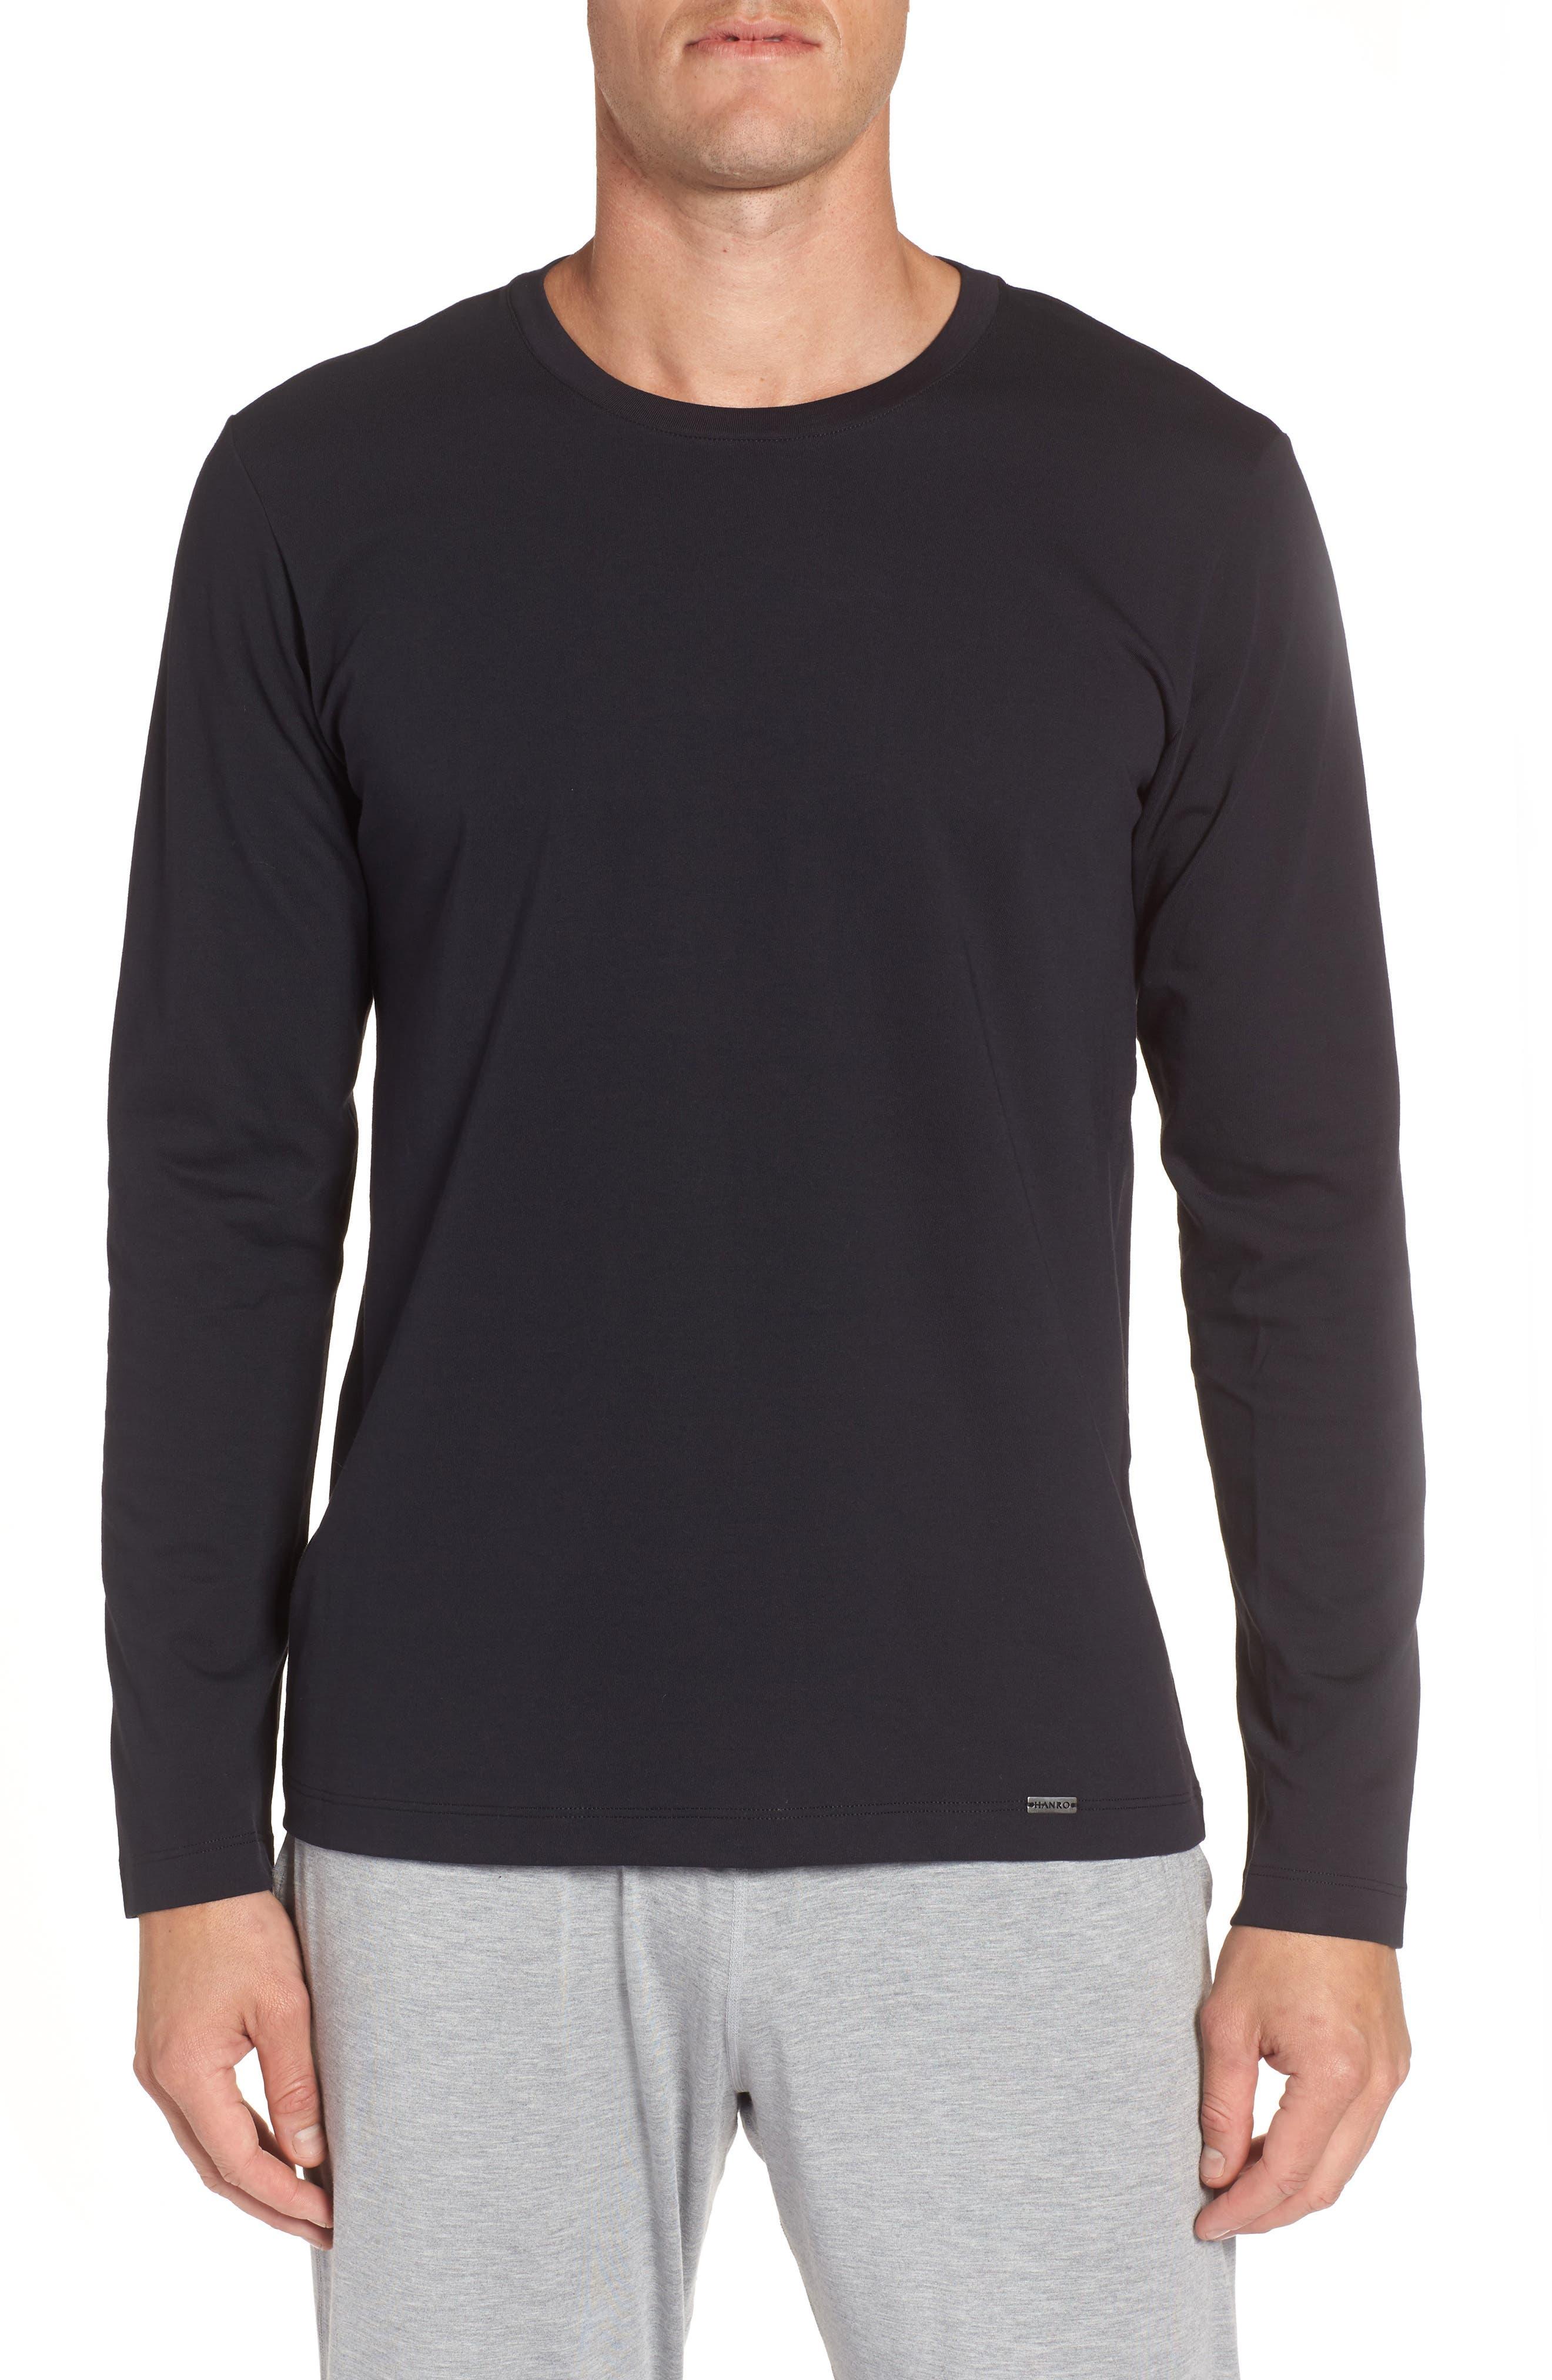 HANRO, Living Long Sleeve T-Shirt, Main thumbnail 1, color, BLACK